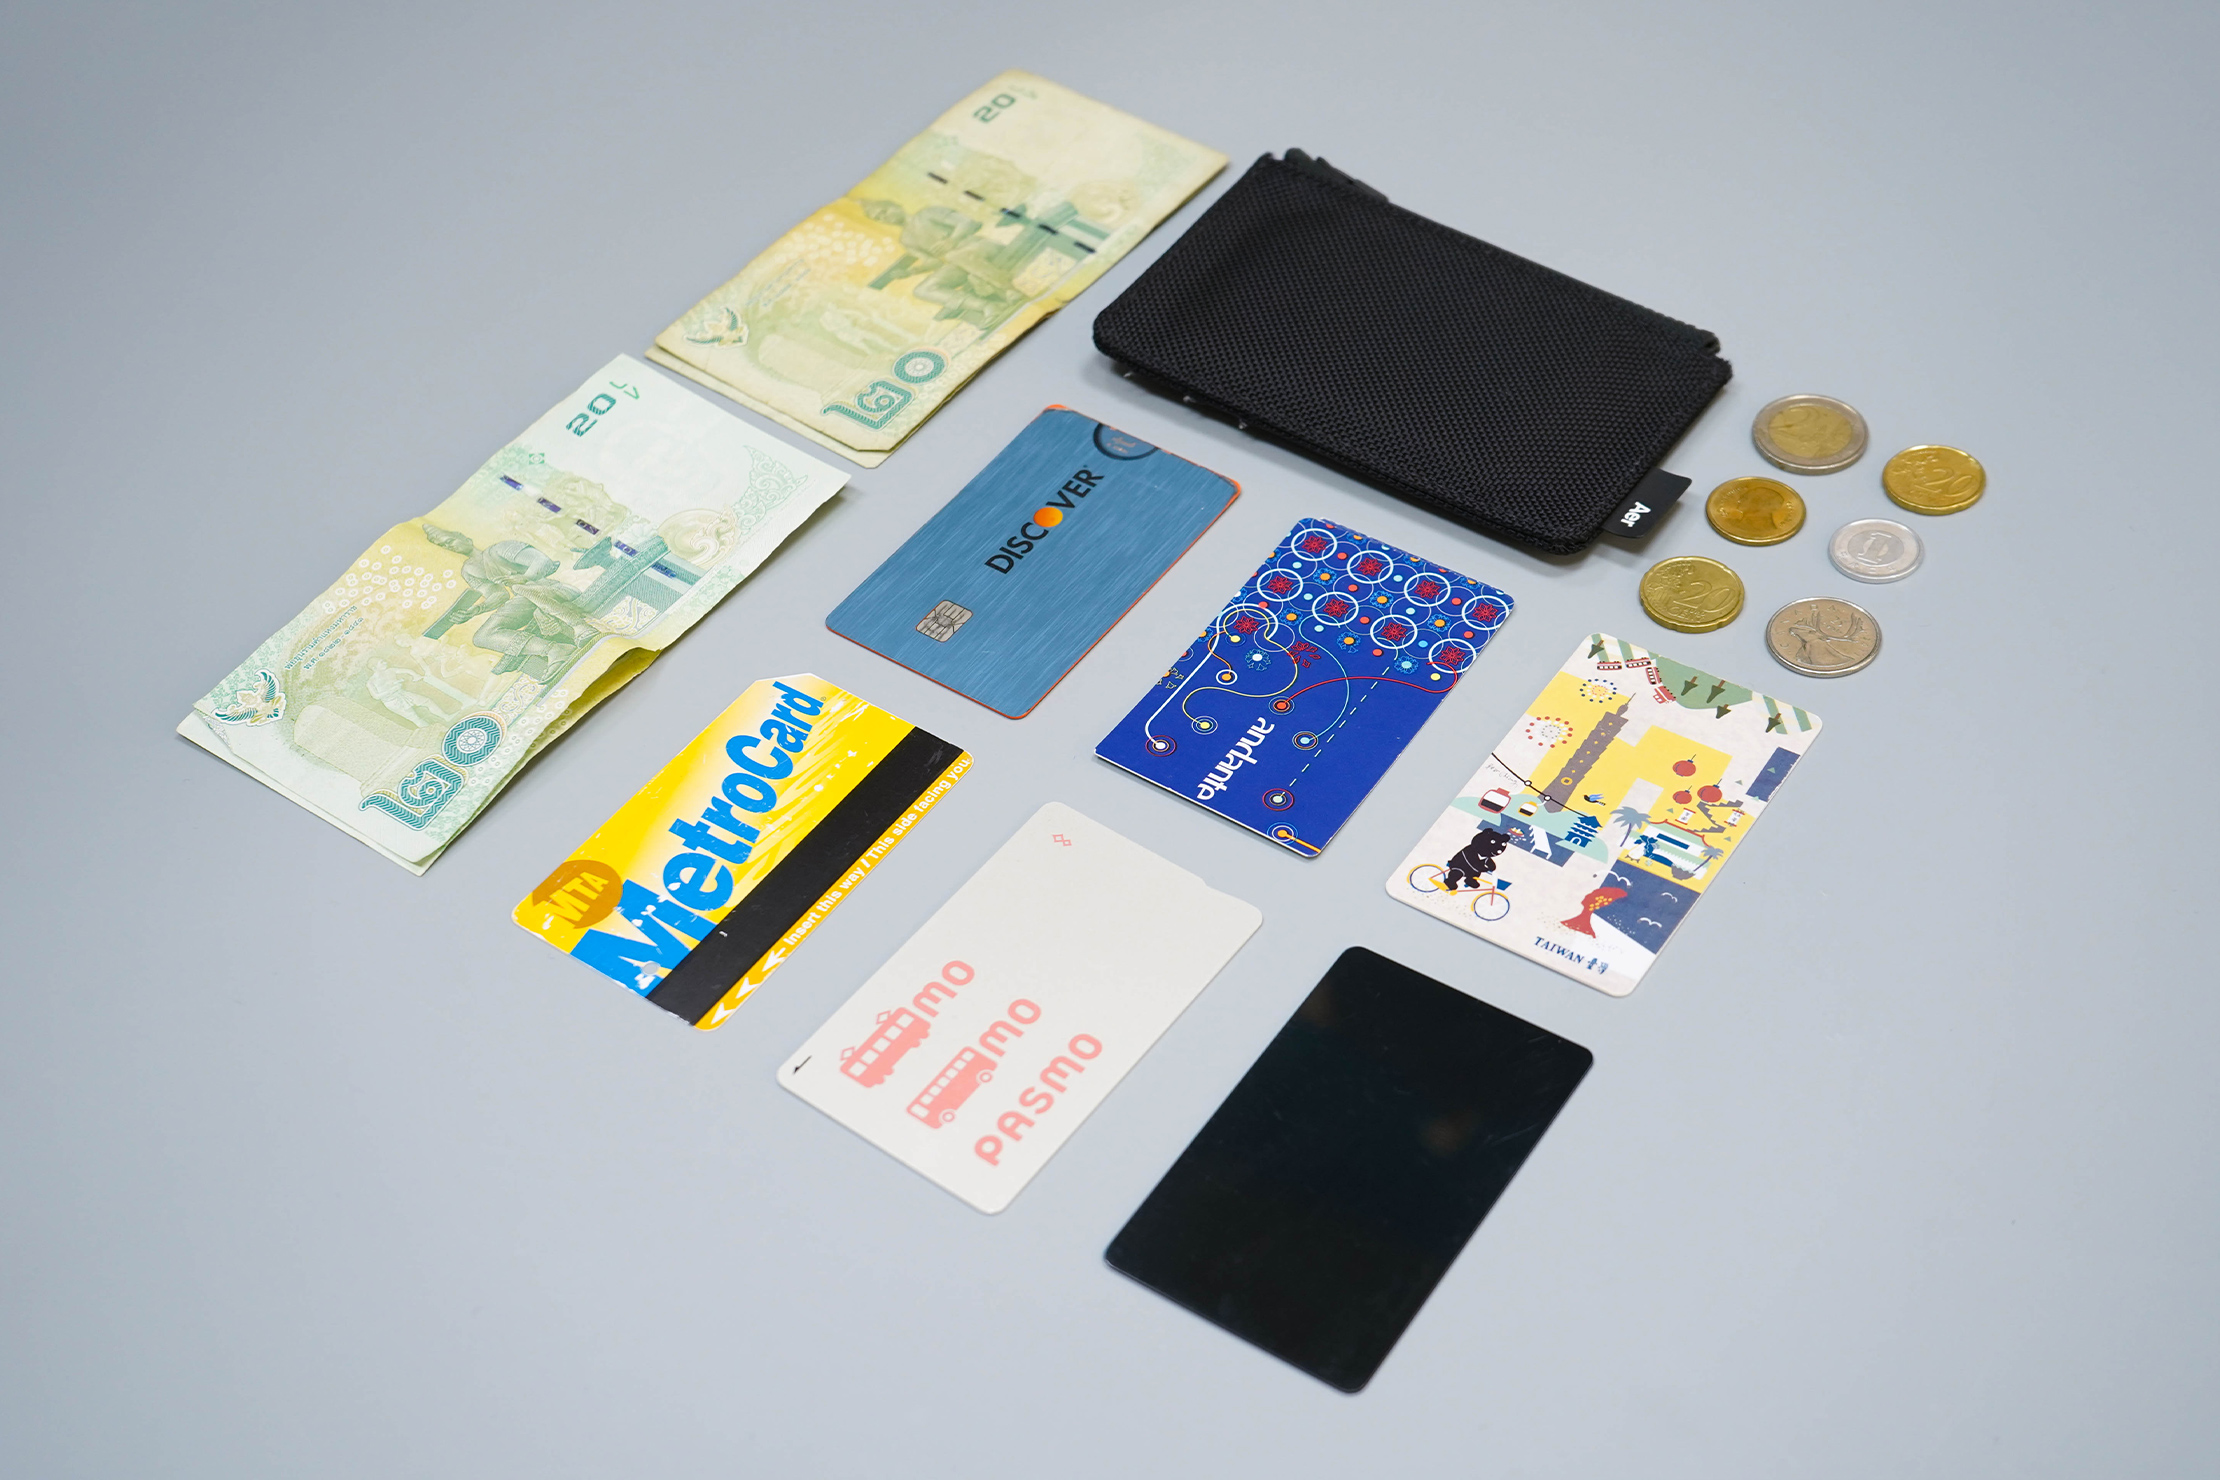 Aer Cardholder Flat Lay